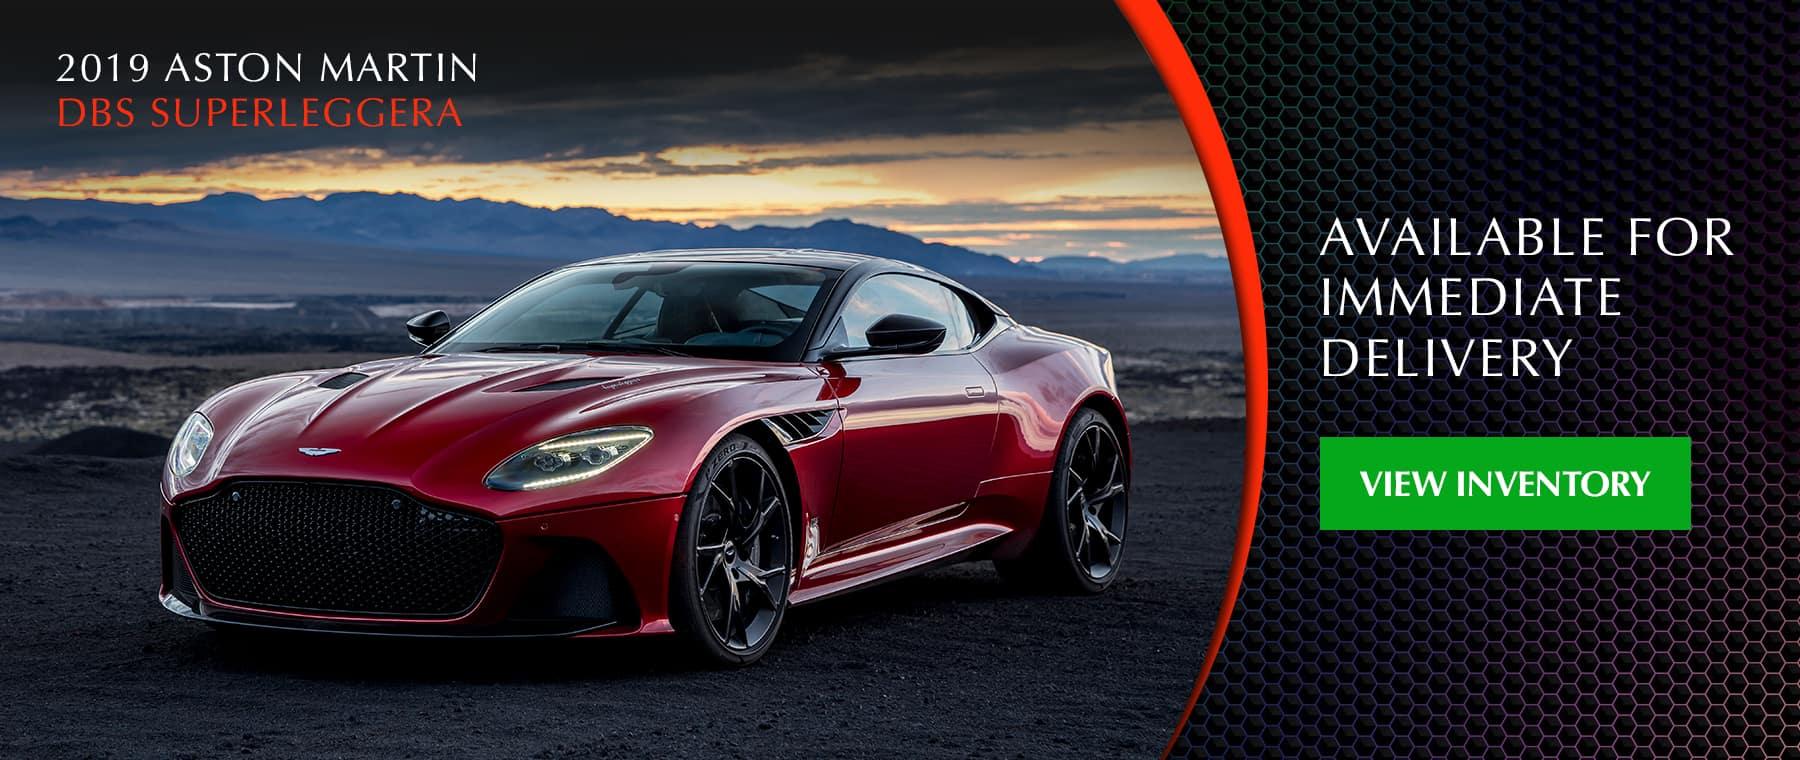 Now taking orders on the new 2020 Aston Martin Vantage